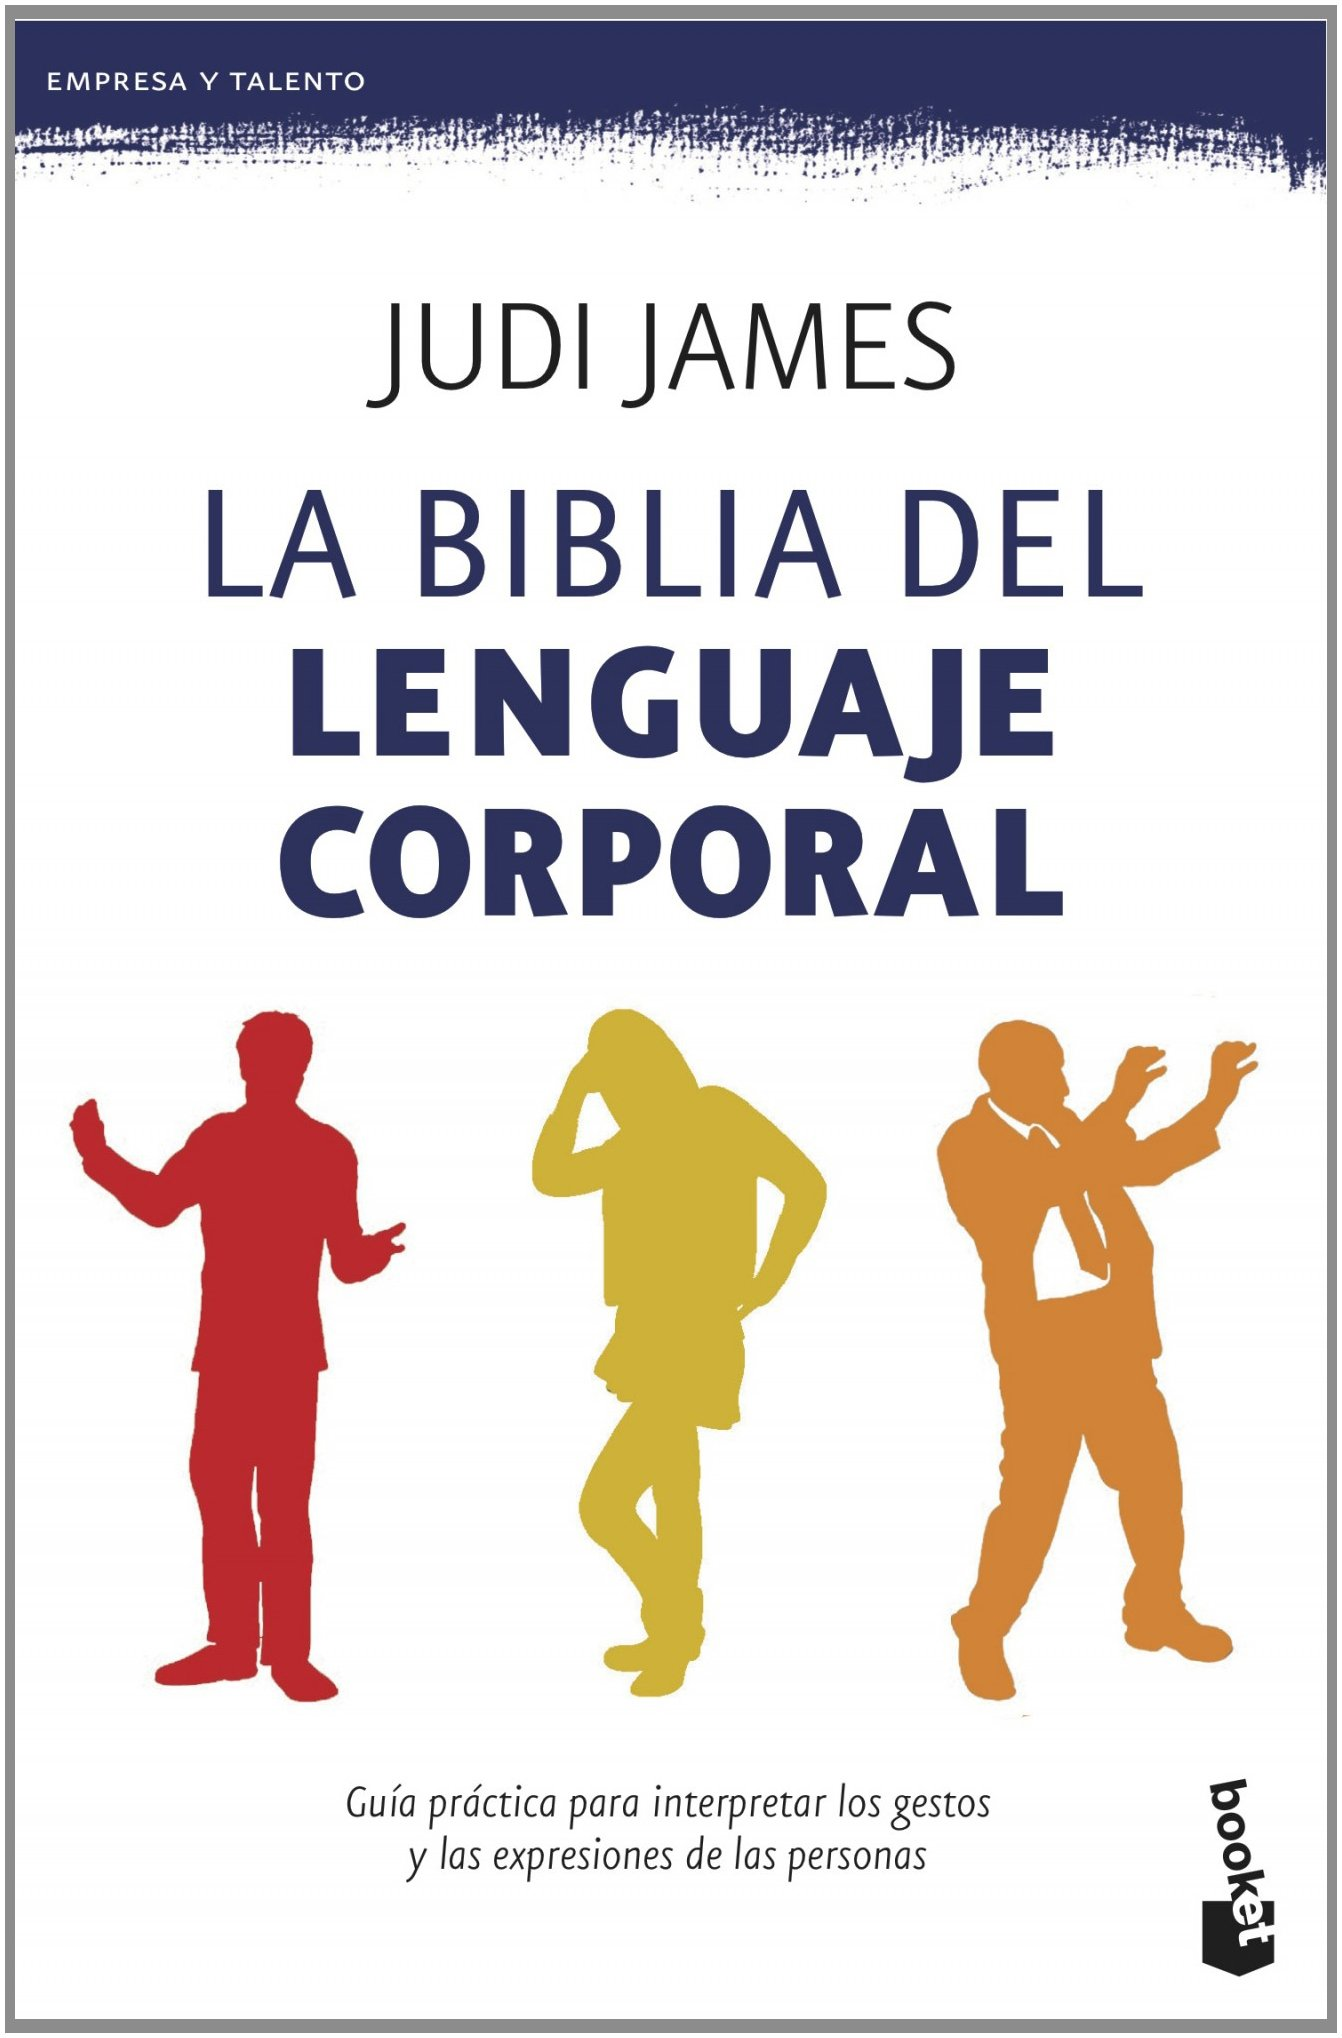 La biblia del lenguaje corporal: Judi James: 9788408123101 ...